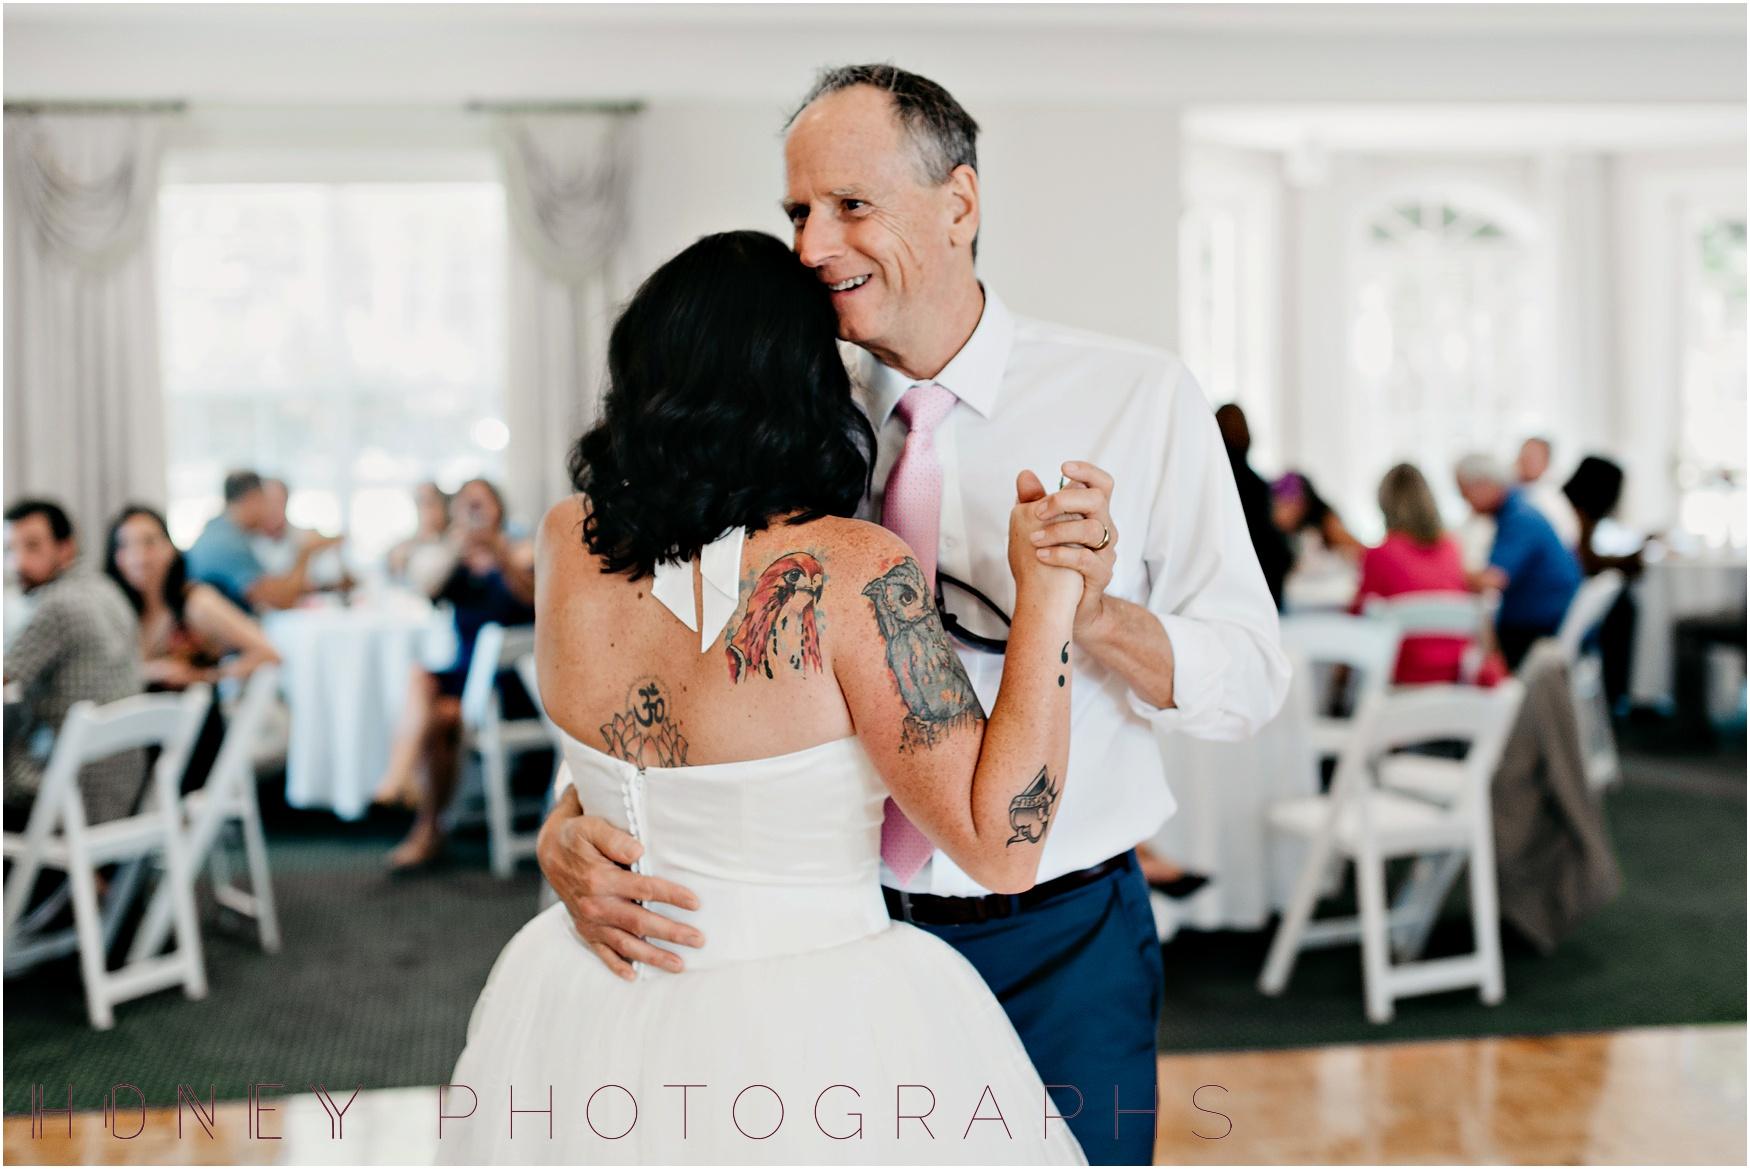 colorful_ecclectic_vibrant_vista_rainbow_quirky_wedding055.jpg